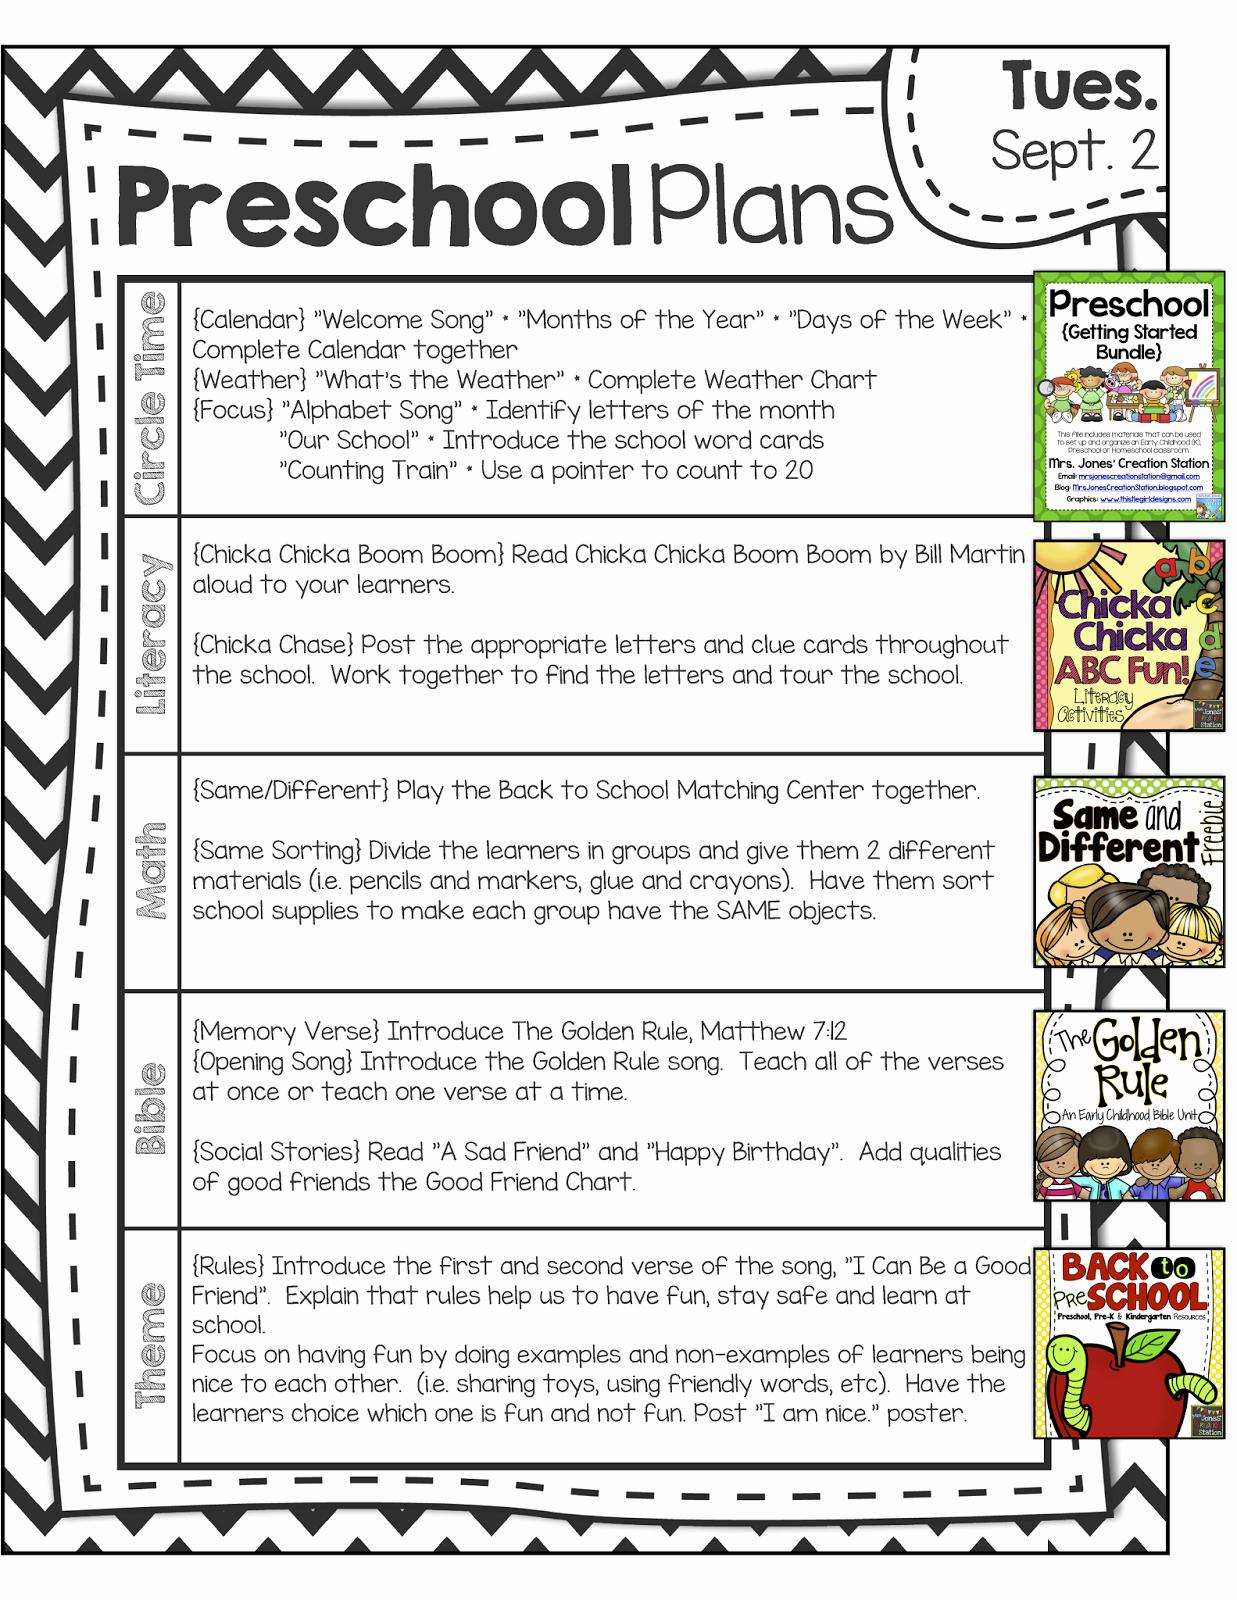 Head Start Lesson Plan Template Luxury Peek at My Week Back to Pre School